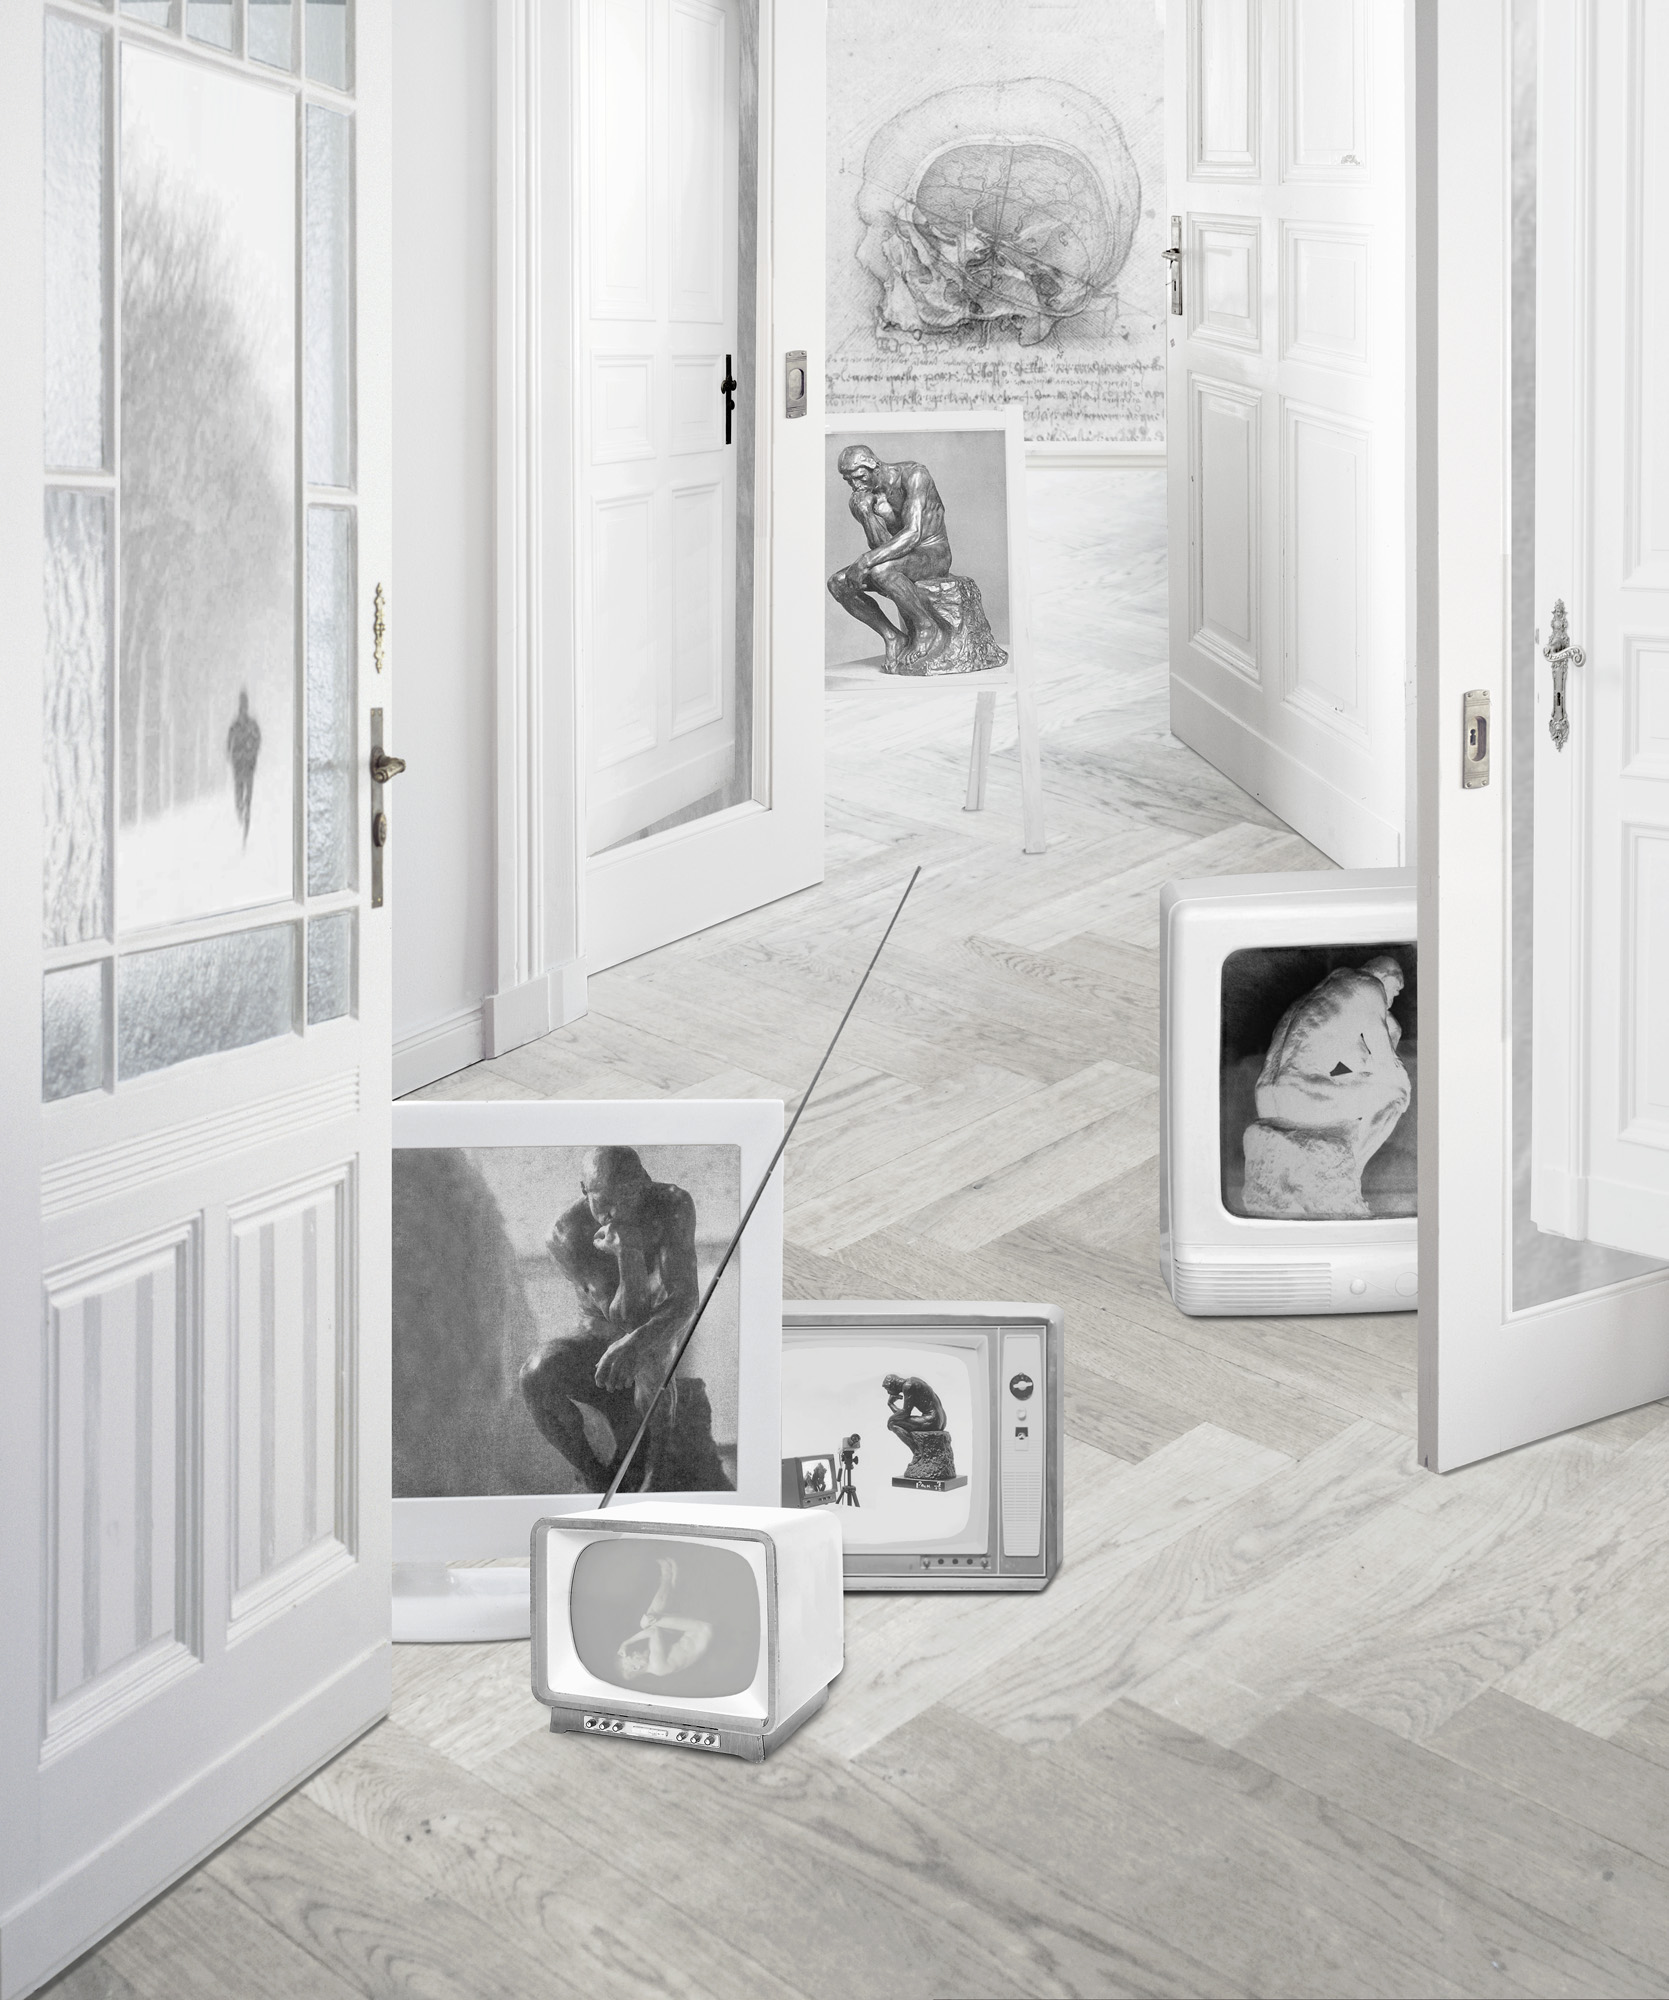 Denker, 2011, C-print, 120 x 100 cm.